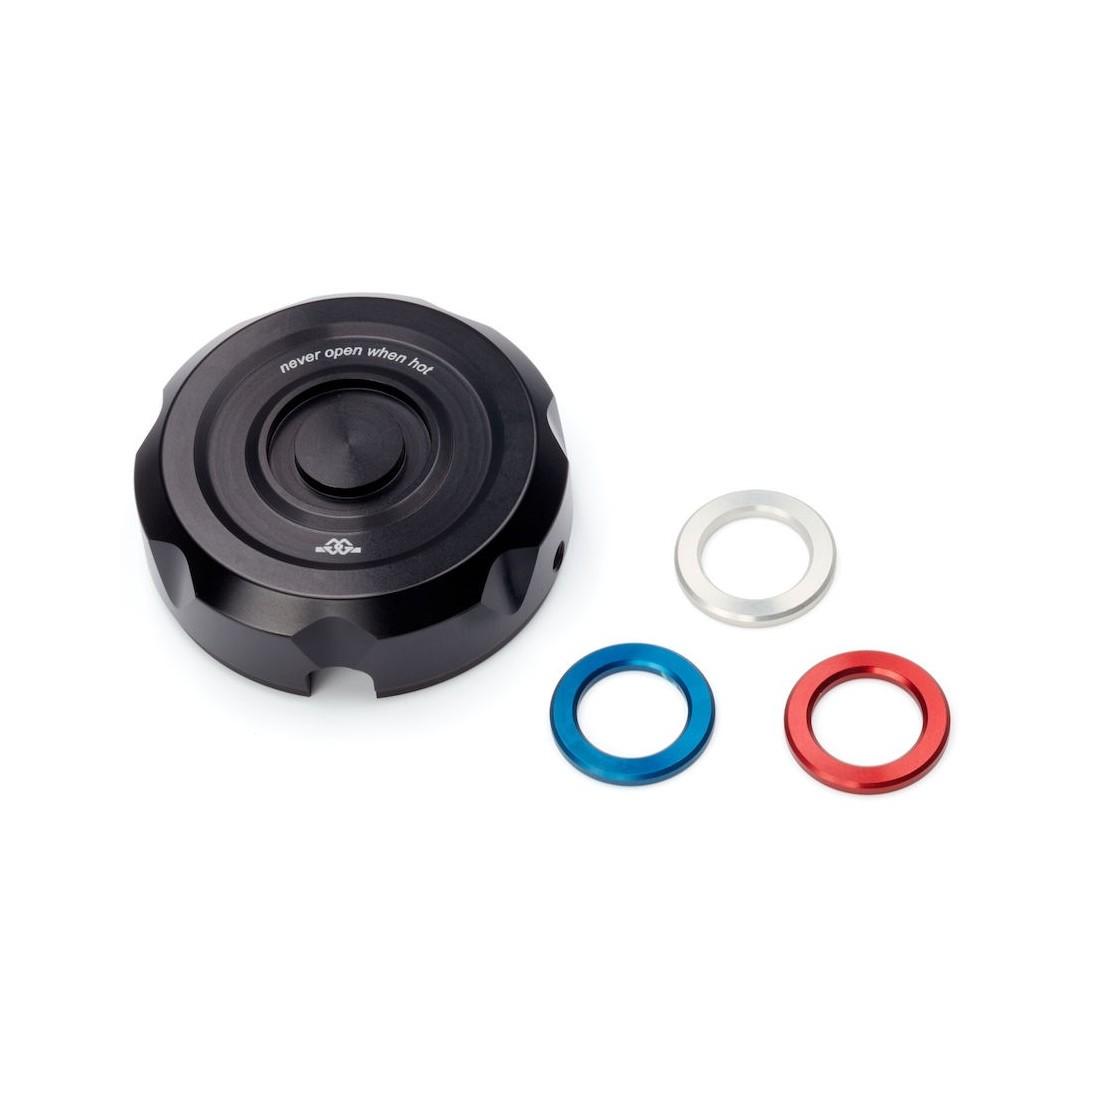 Tapón Radiador Yamaha MT-10 16-18 Negro